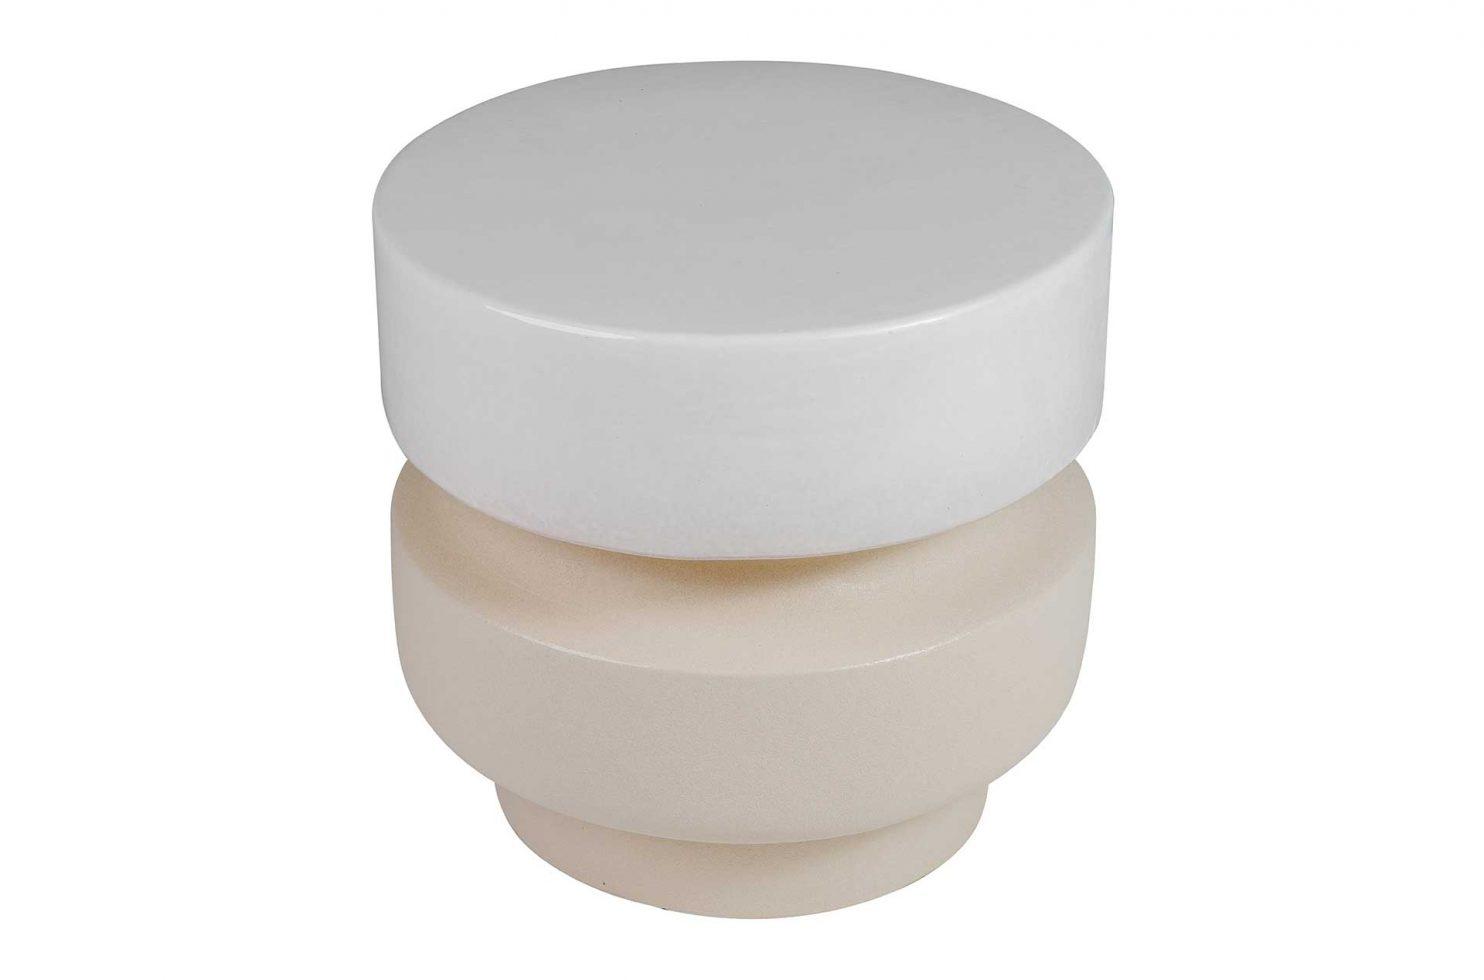 prov cer balance stool 16in C3080403435 linen sand above web